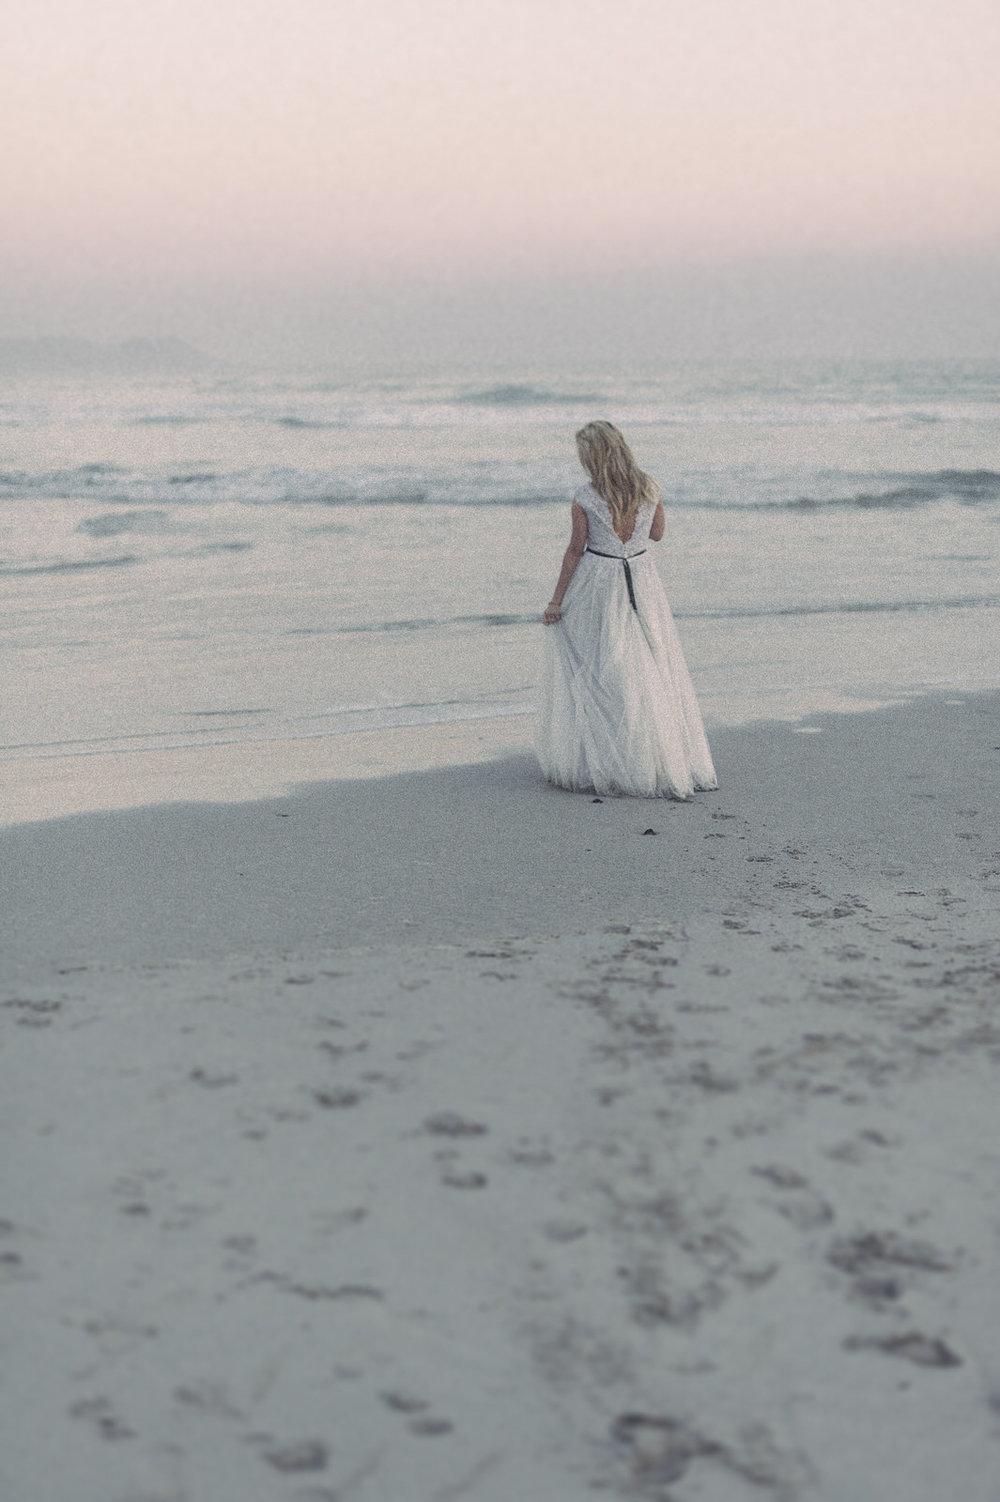 RyanParker_Wedding_Photographer_CapeTown_Hermanus_StyledShoot_DSC_6134.jpg